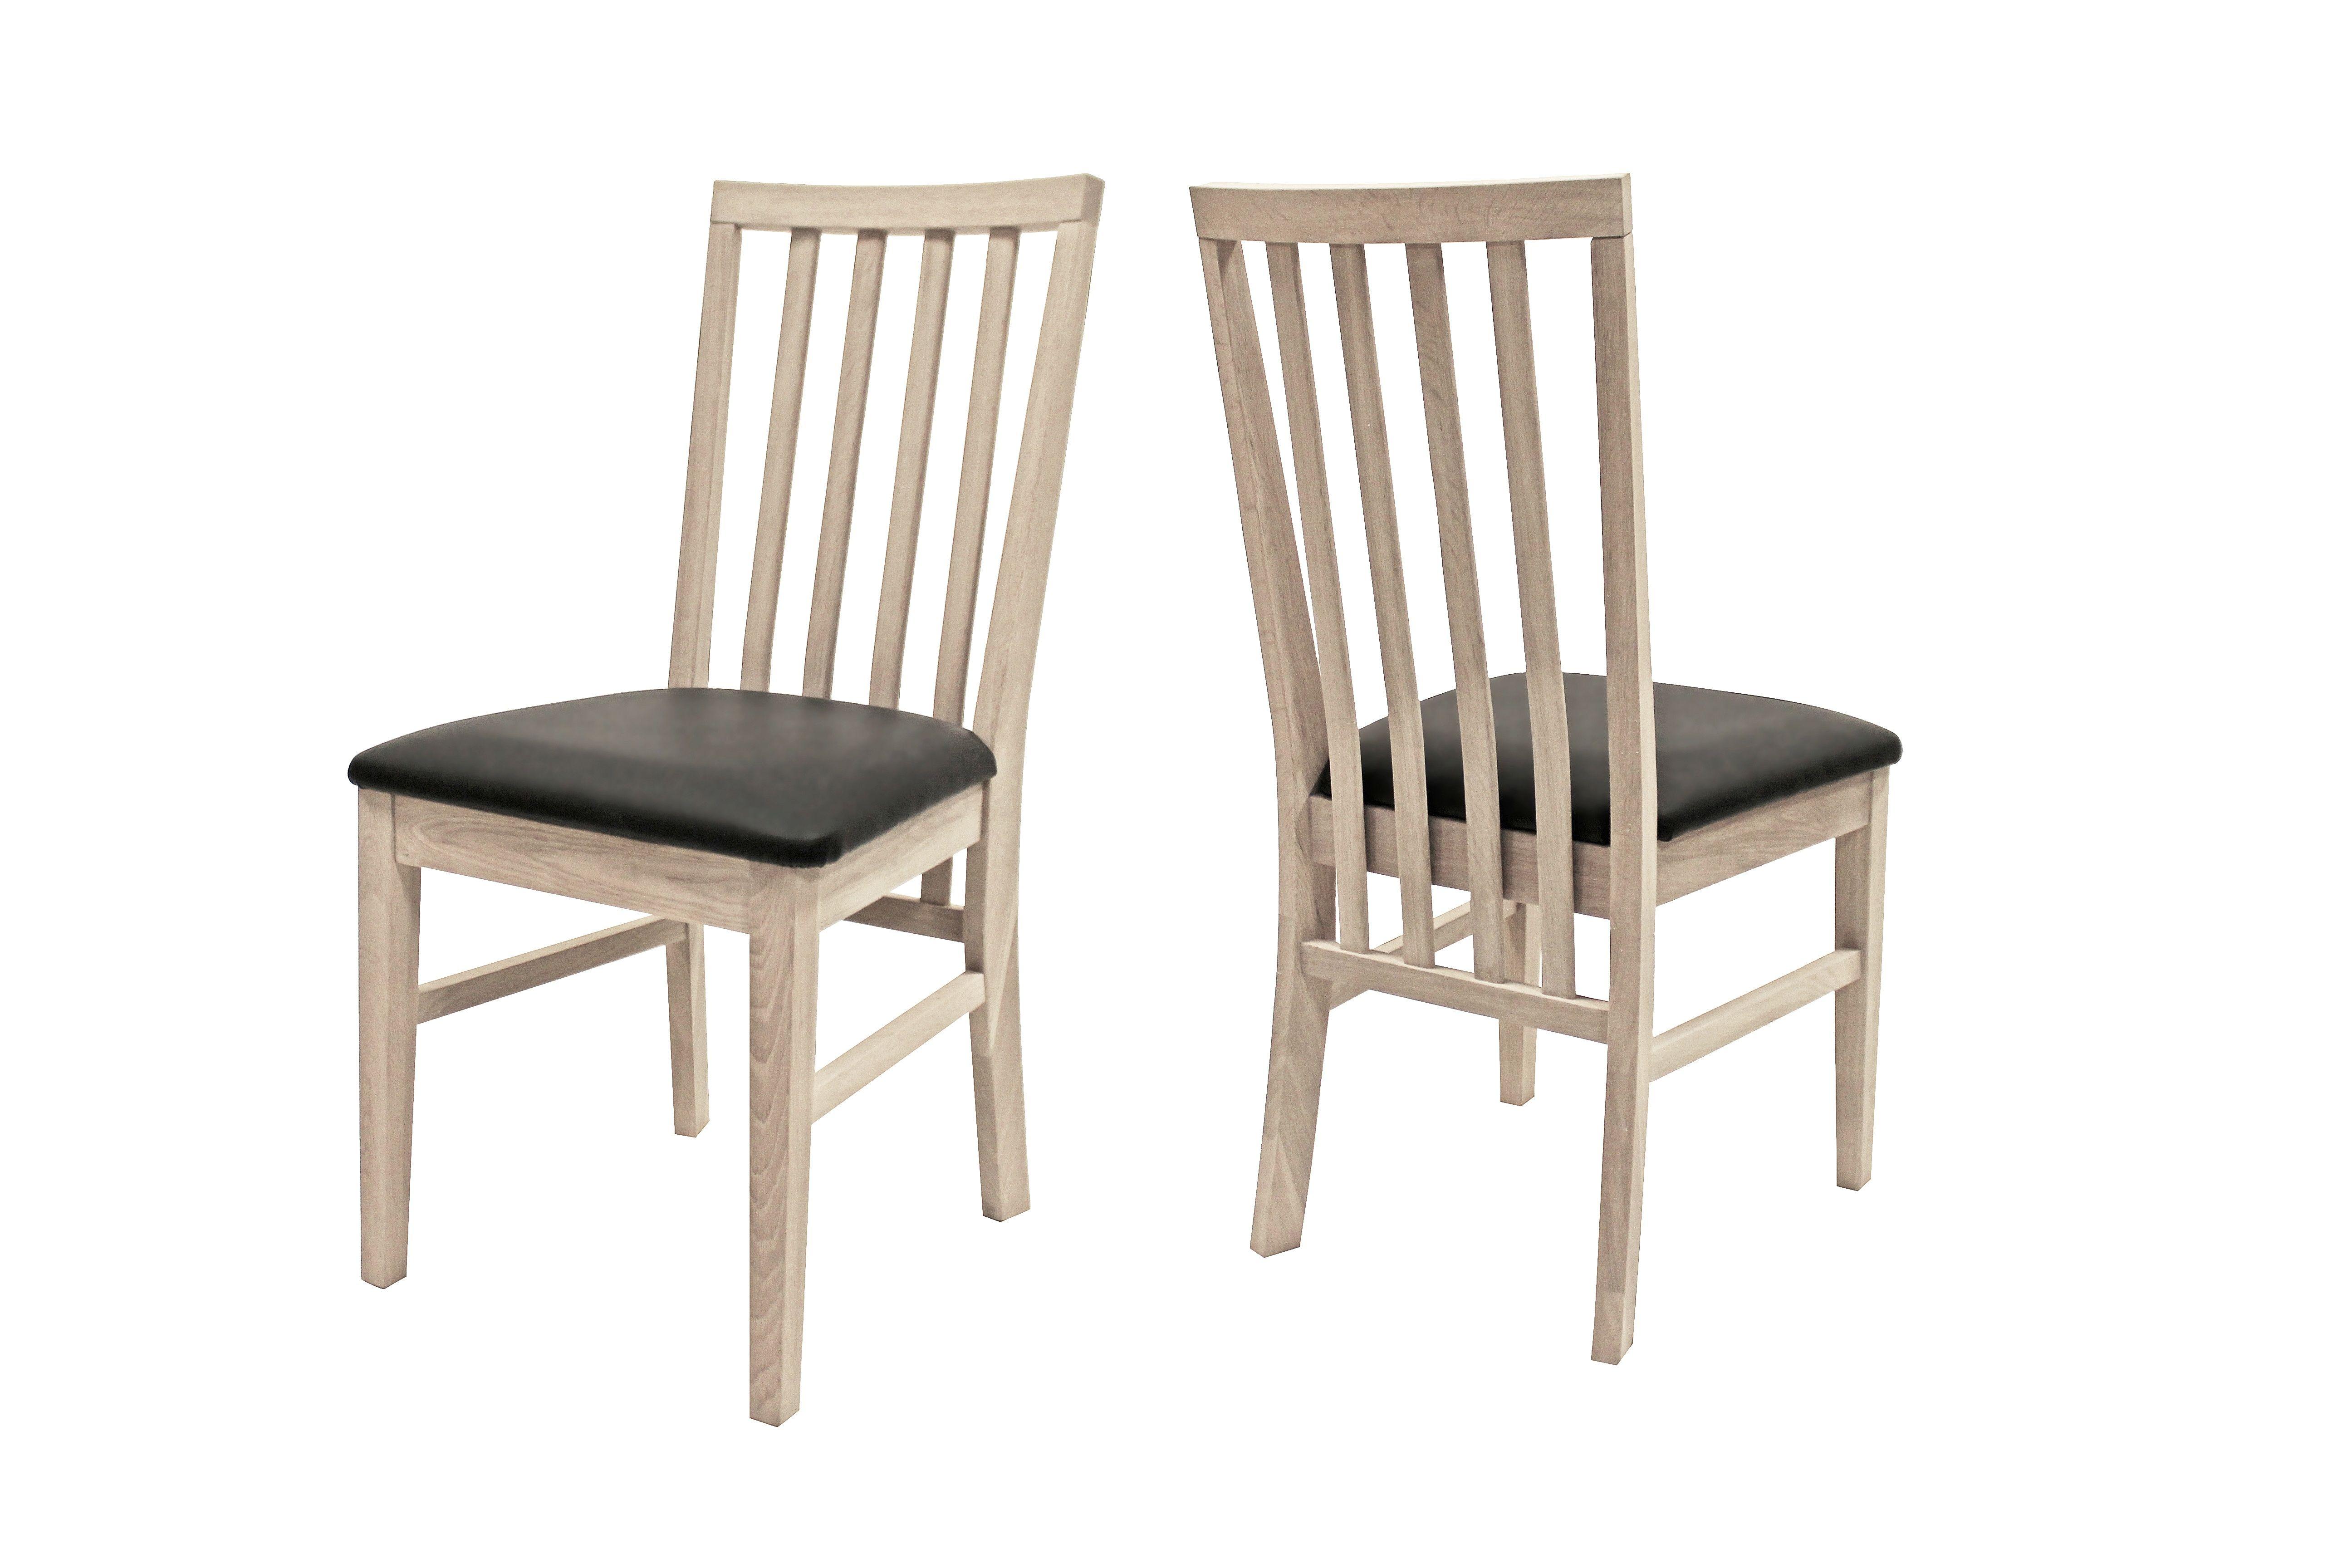 stuhl eiche wei excellent mdf italia flow stuhl fe vn in with stuhl eiche wei best stuhl in. Black Bedroom Furniture Sets. Home Design Ideas